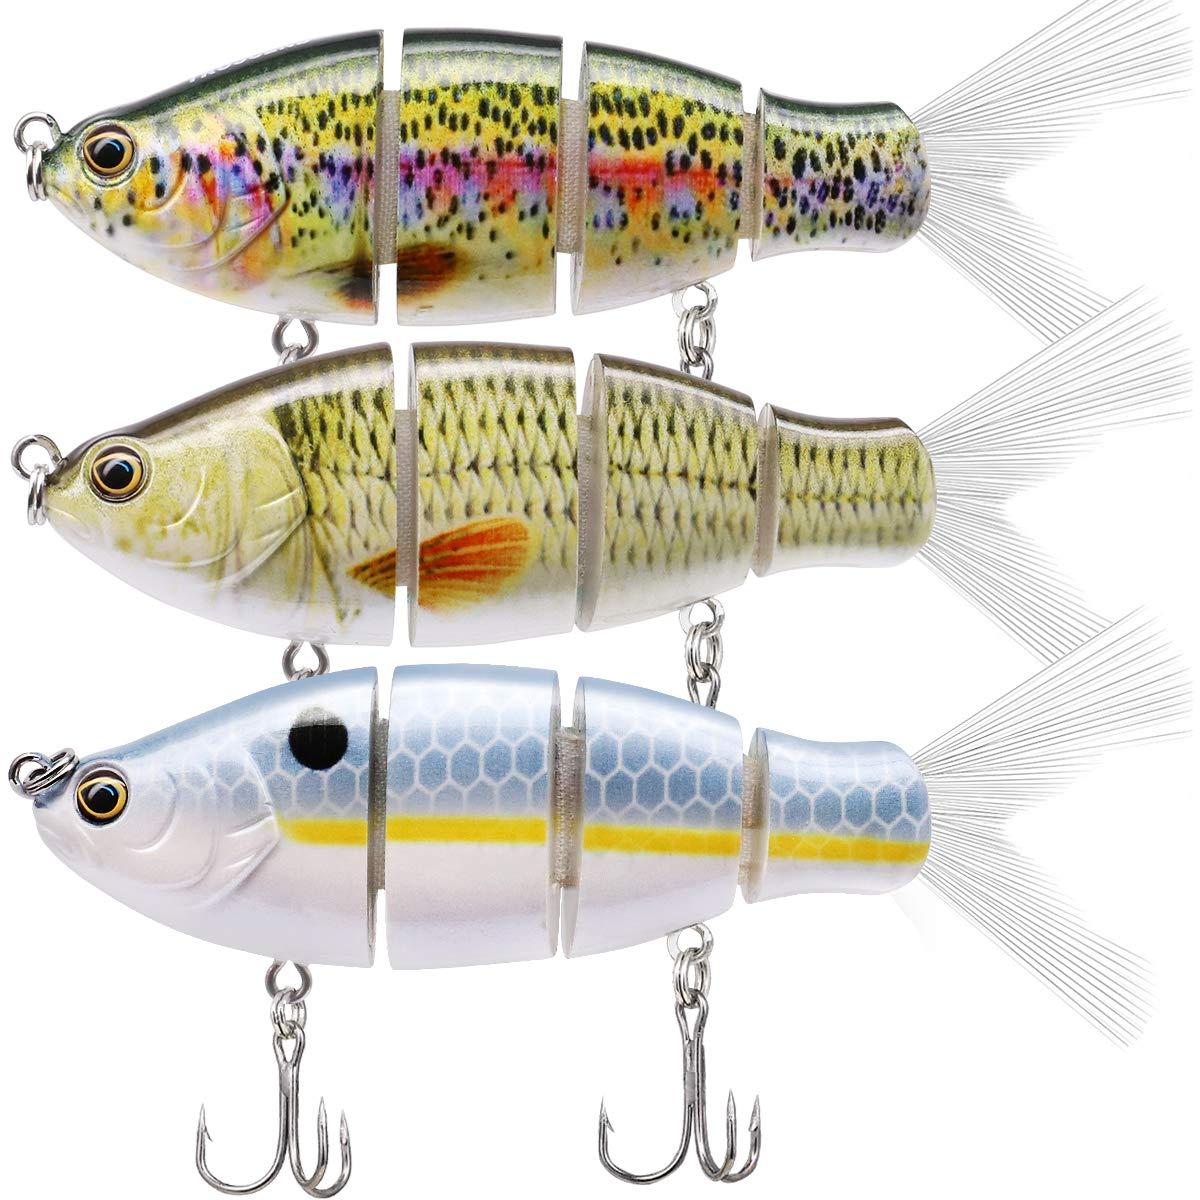 TRUSCEND Fishing Lures Swimbait Bass, 10cm 3.93'' Fishing Lures Crankbait Jointed Trout Swimbait Mustad Hooks (Combo C)